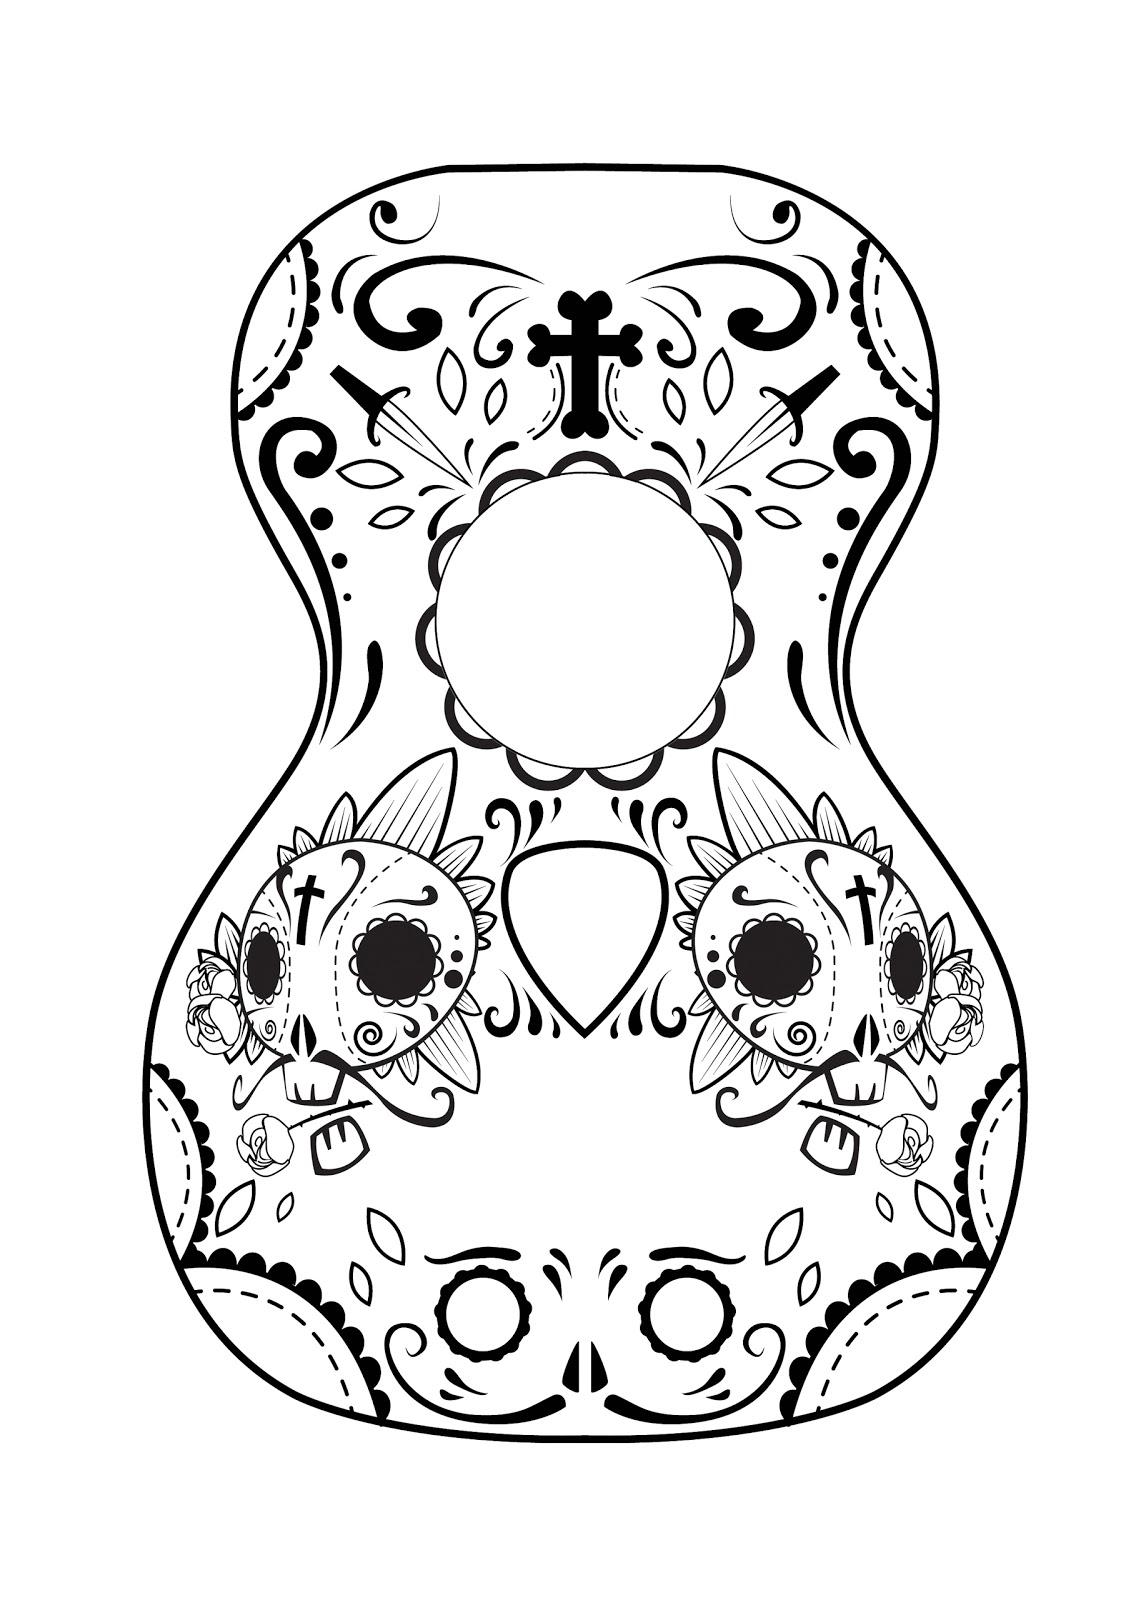 Calavera Mask Coloring Page Coloring Pages